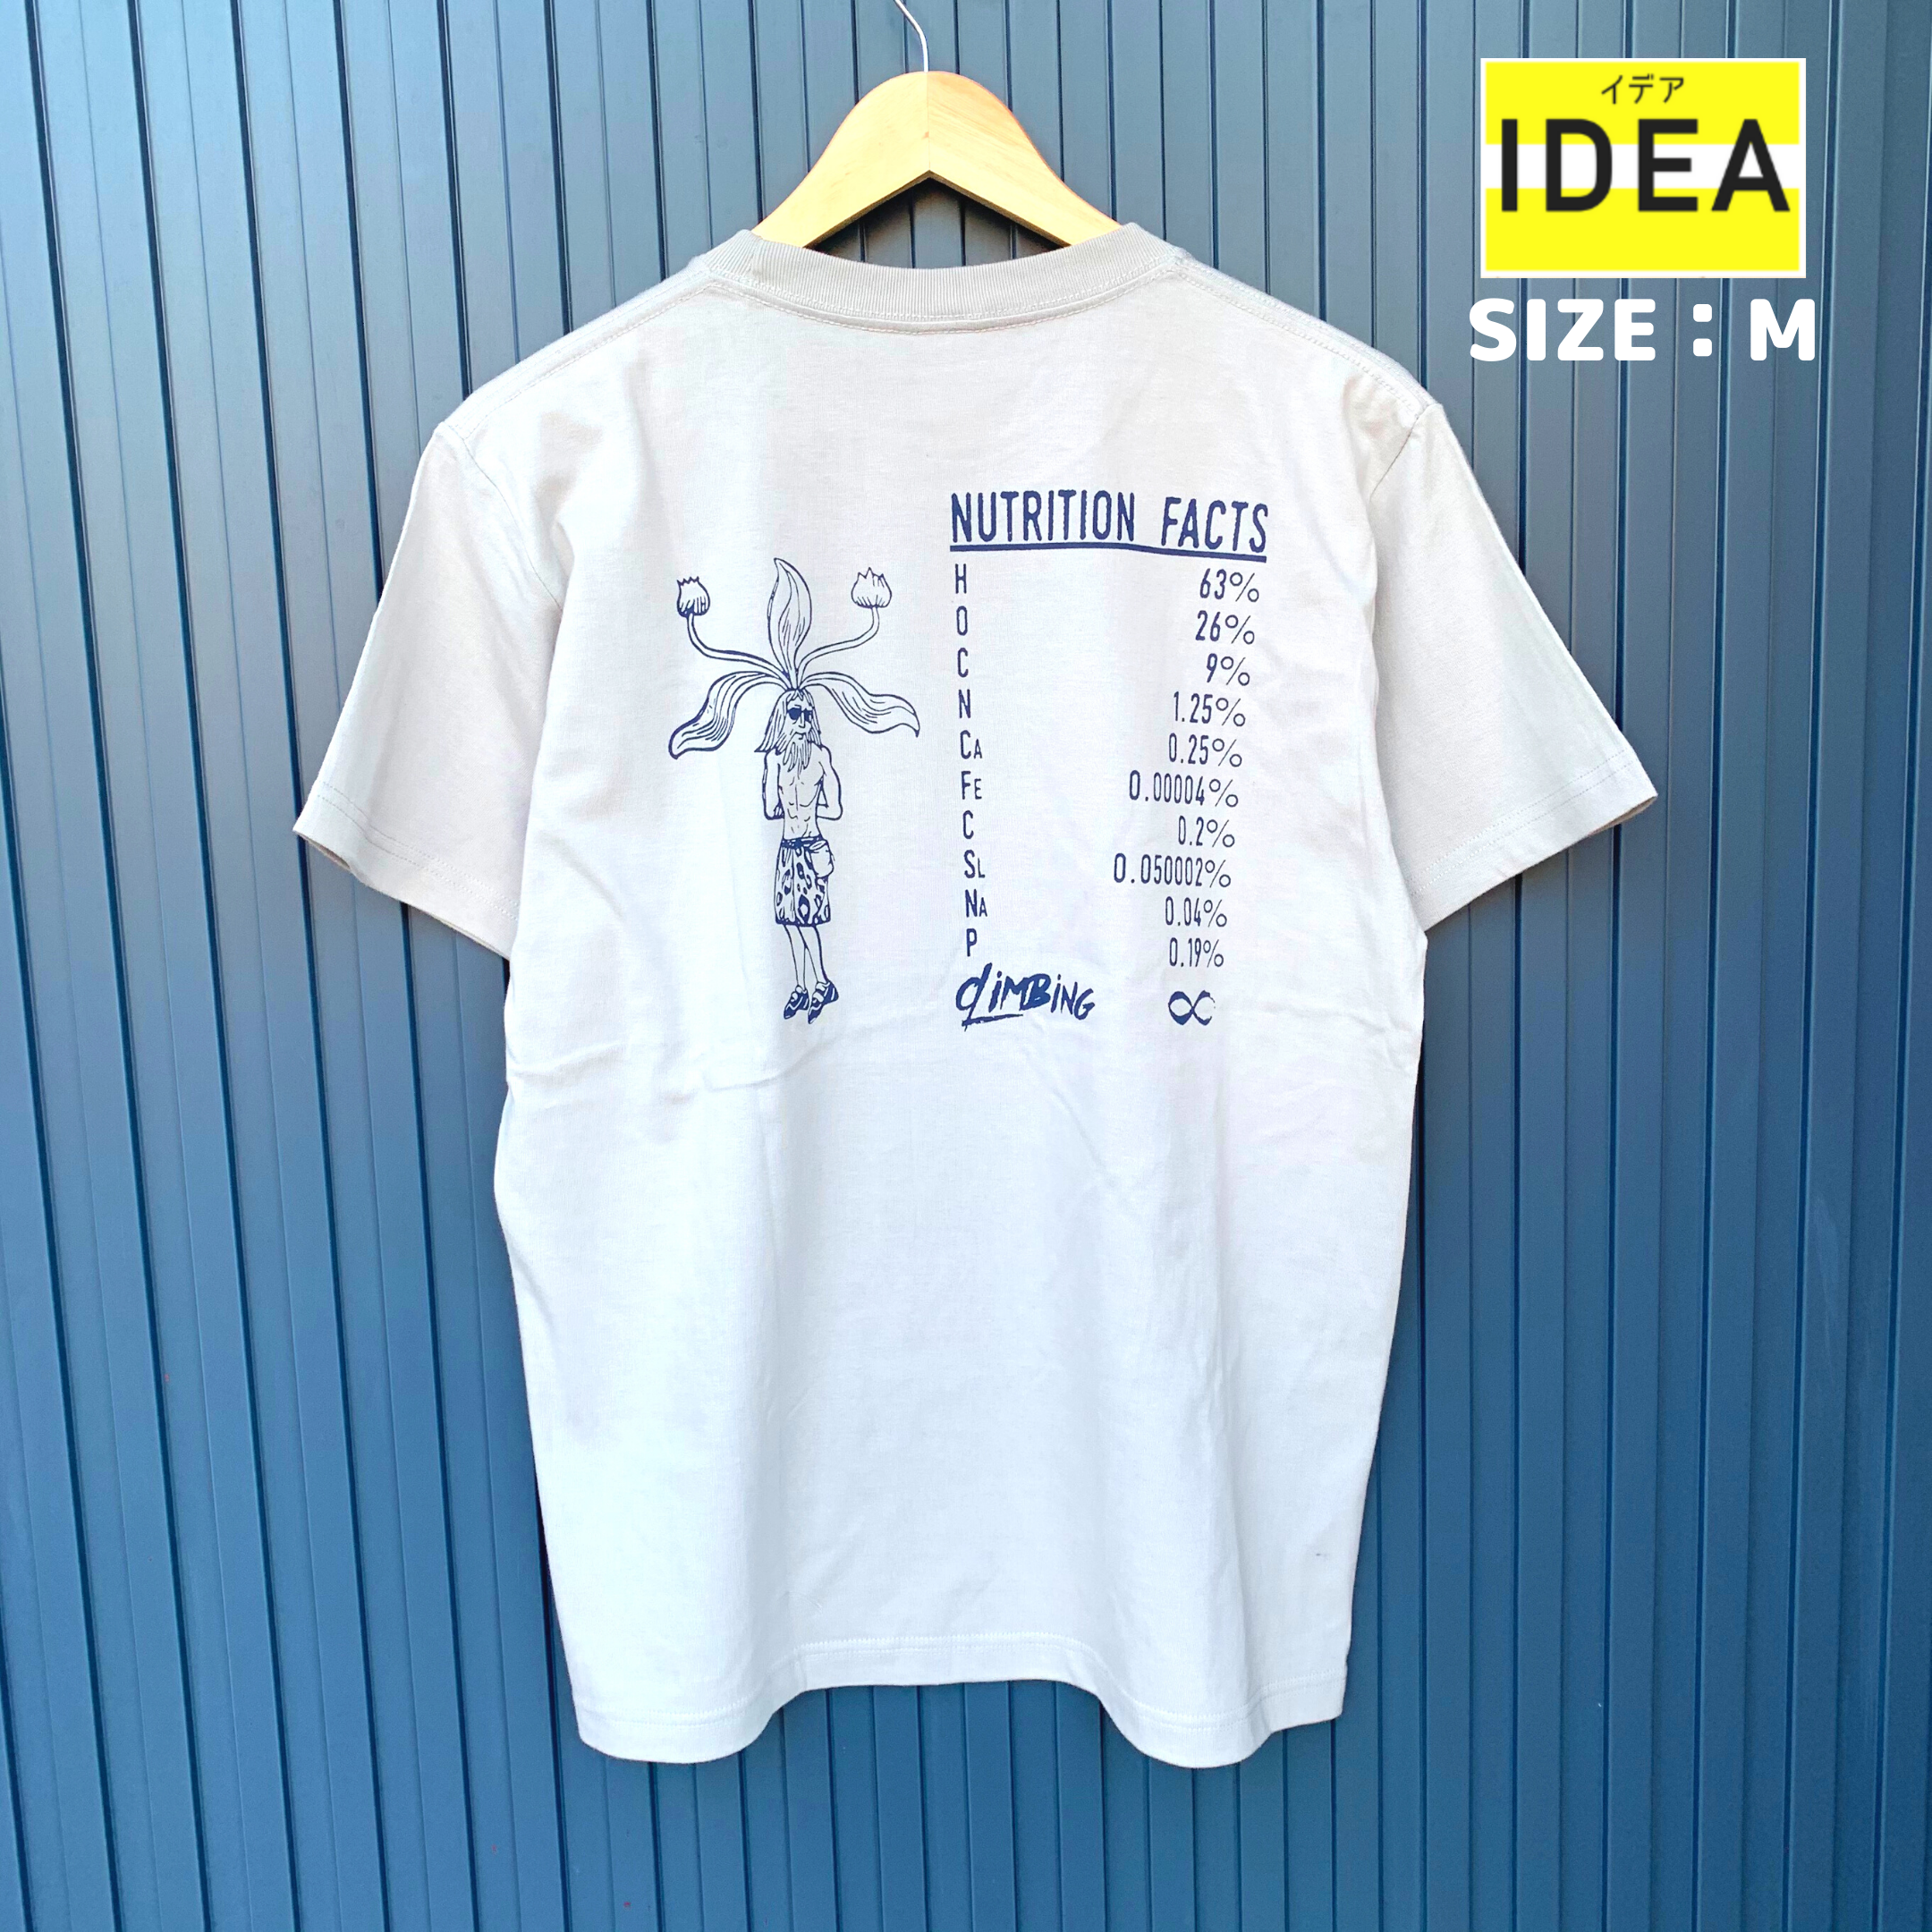 【IDEA】M- FACT